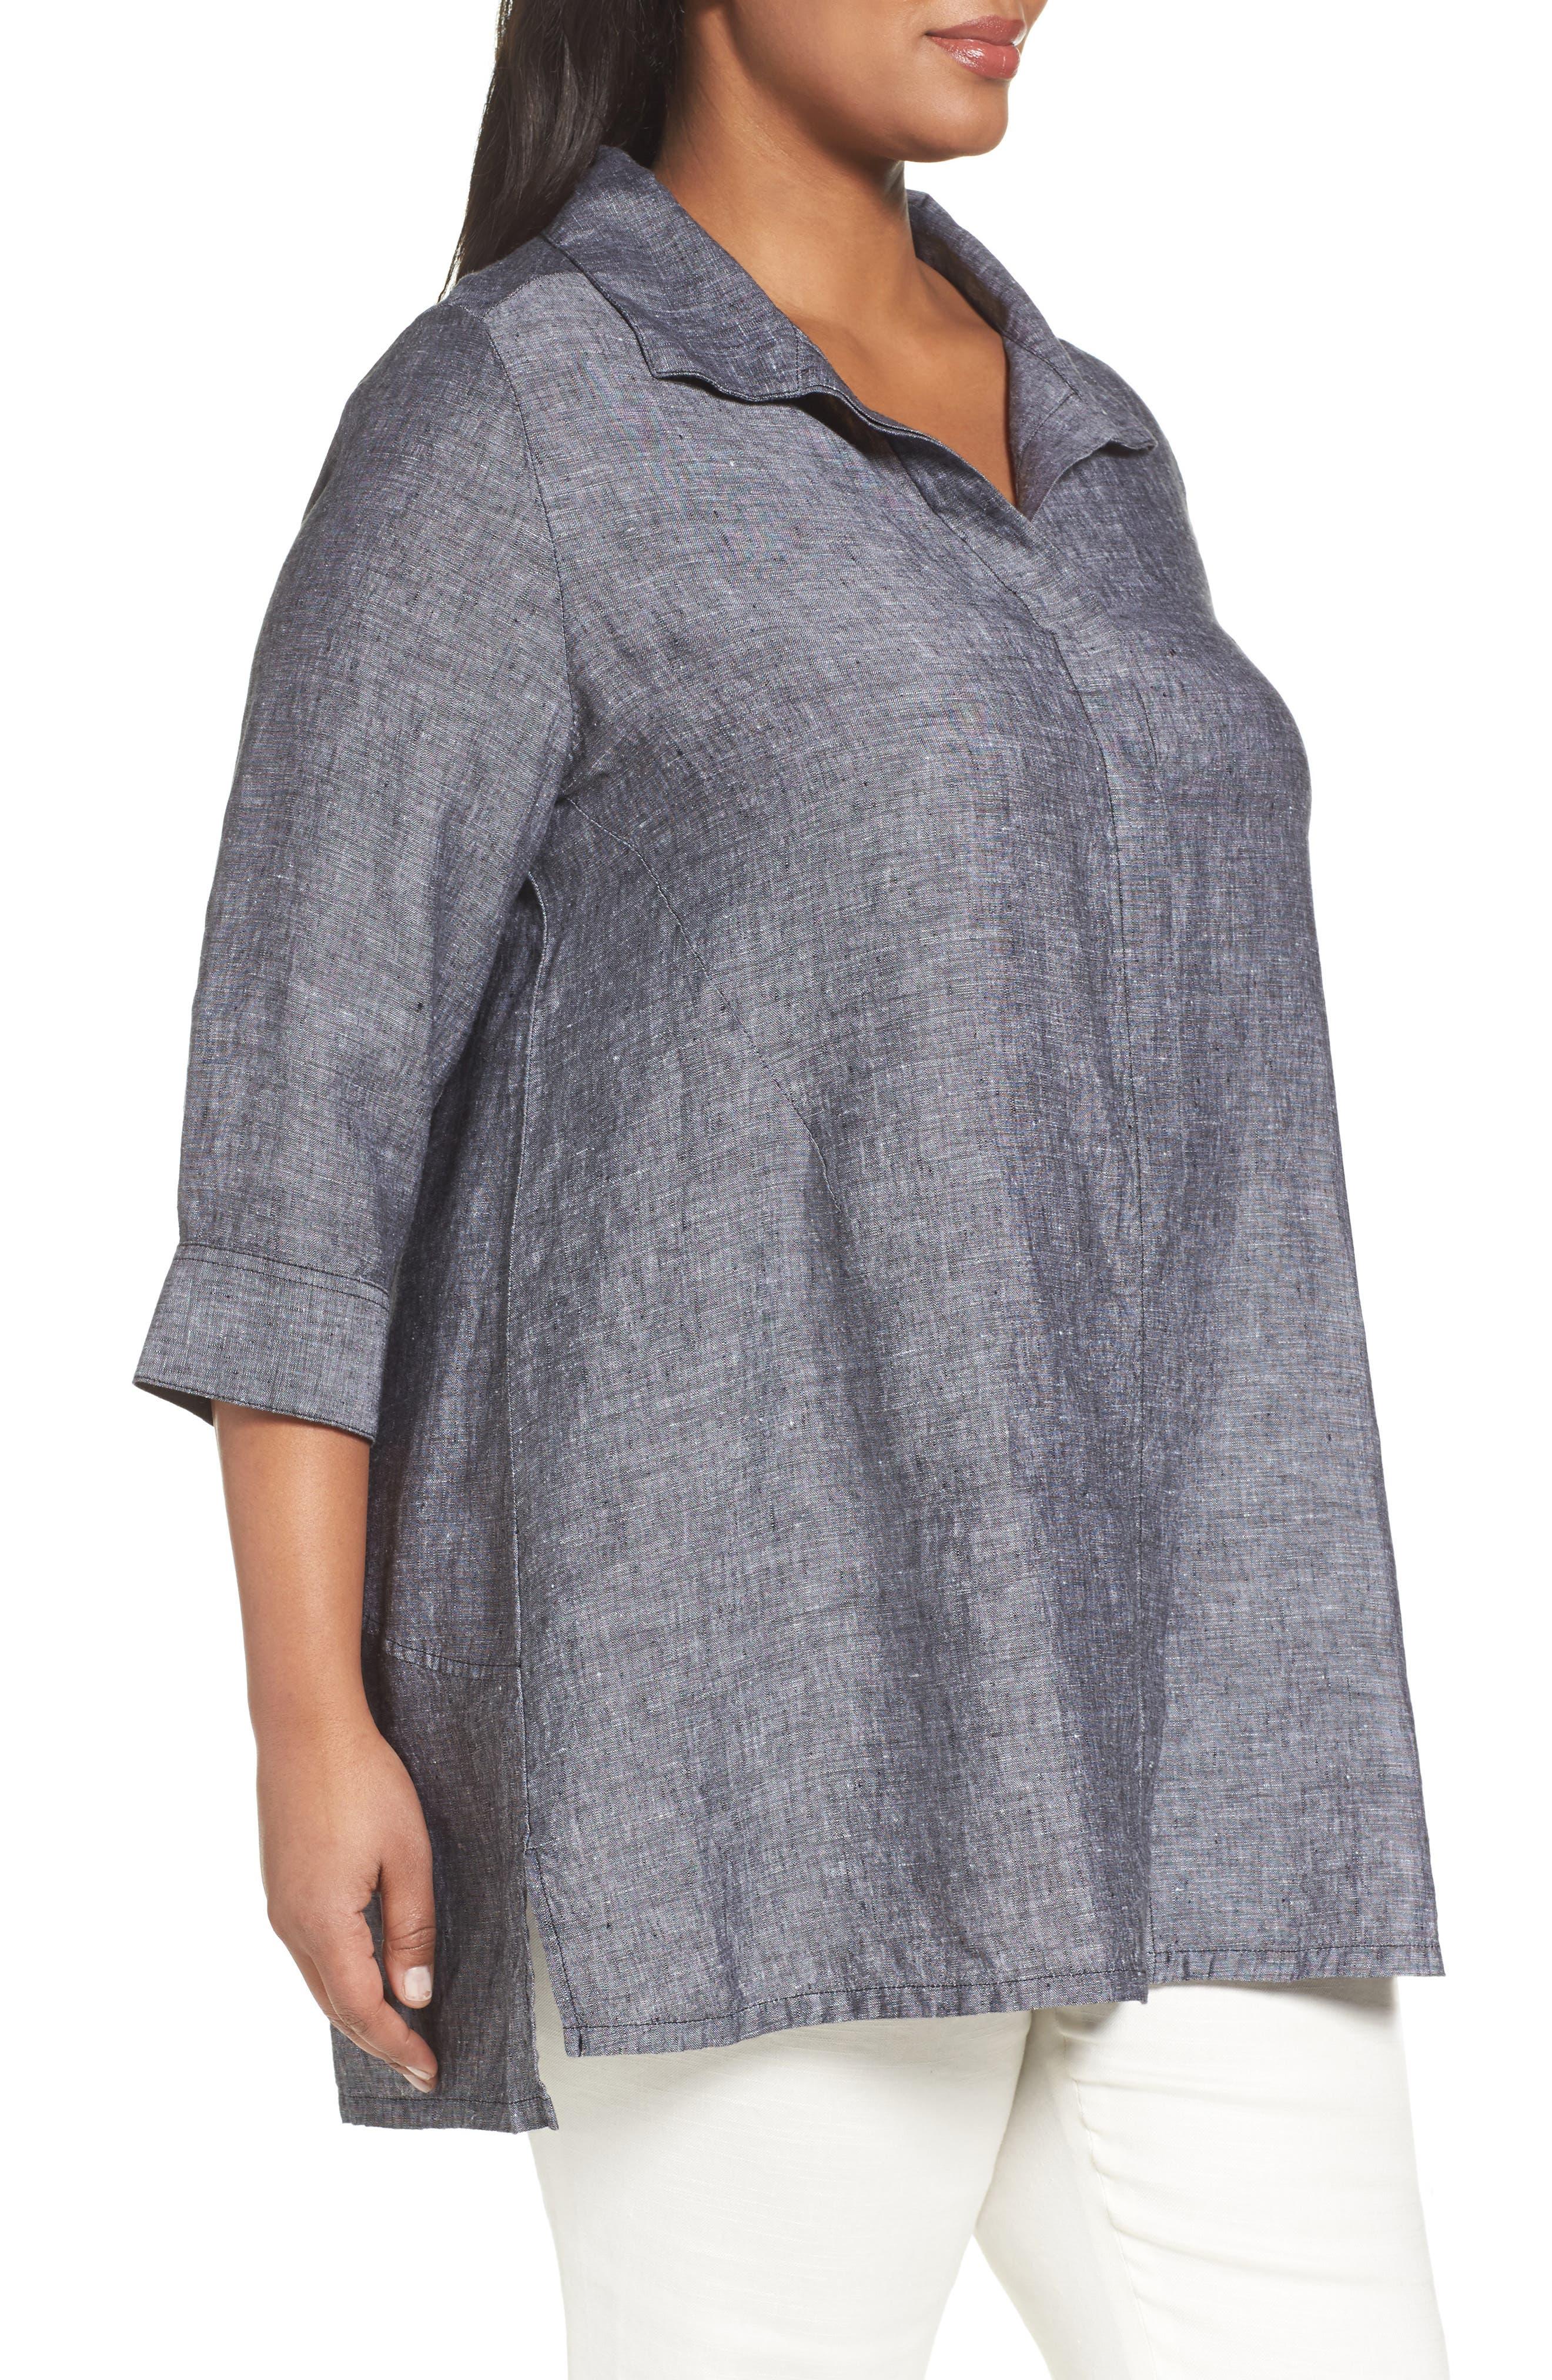 FOXCROFT, Chambray Linen Tunic Shirt, Alternate thumbnail 3, color, BLACK